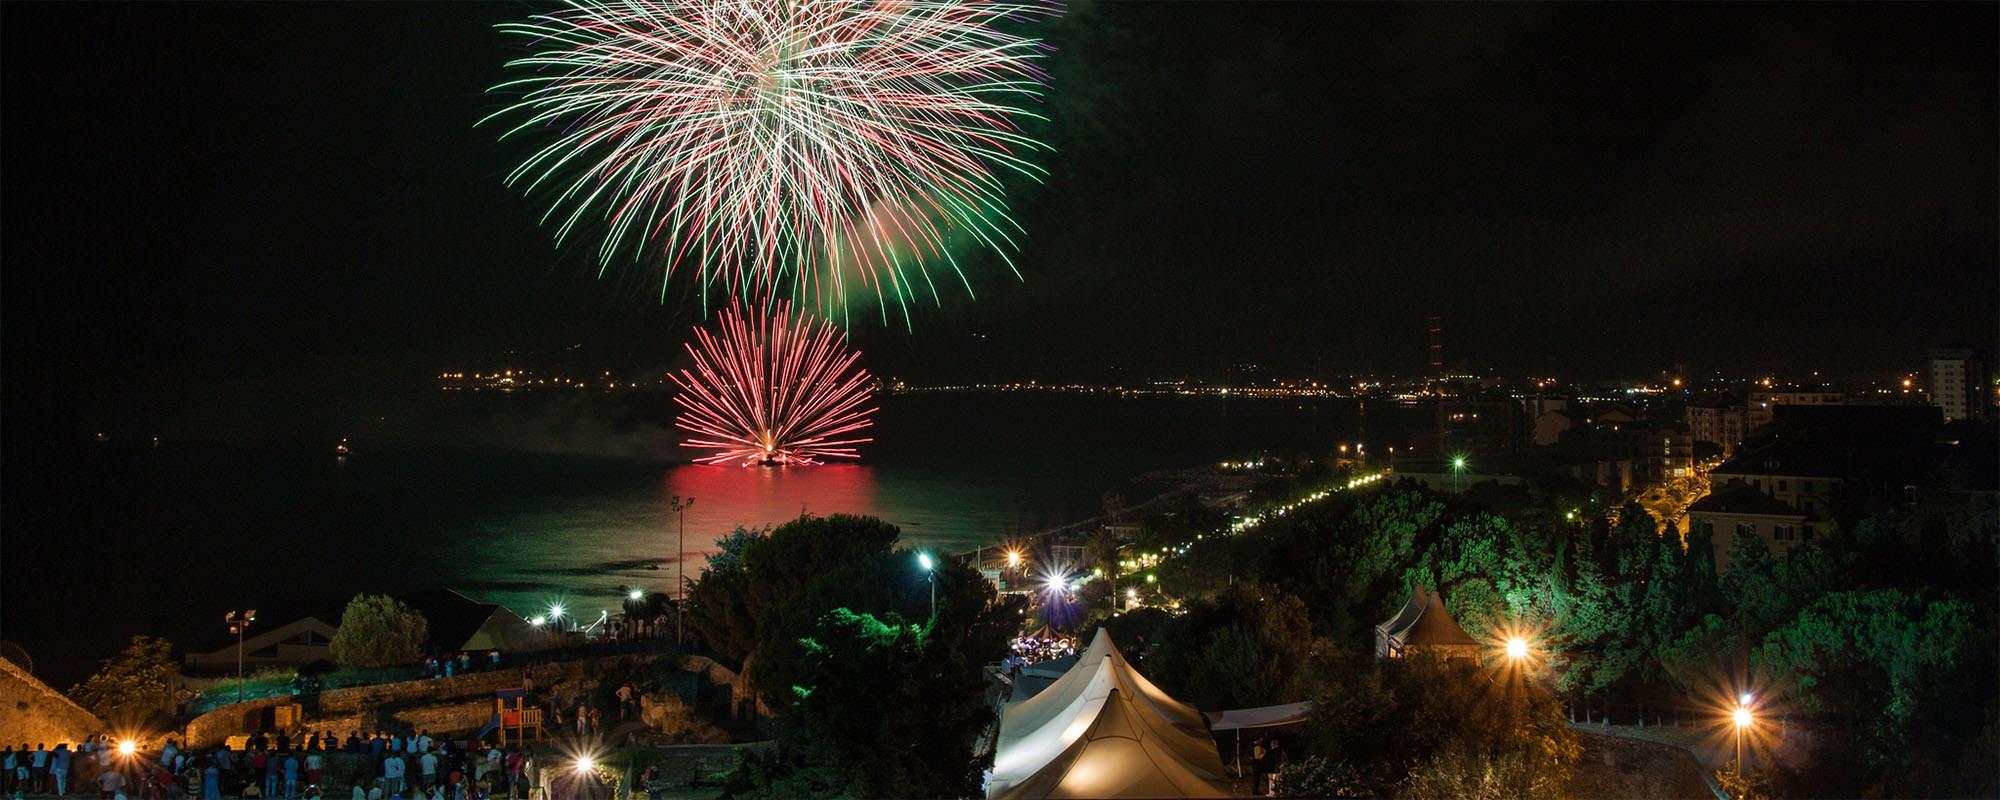 Fuochi d'artificio a Savona, Liguria